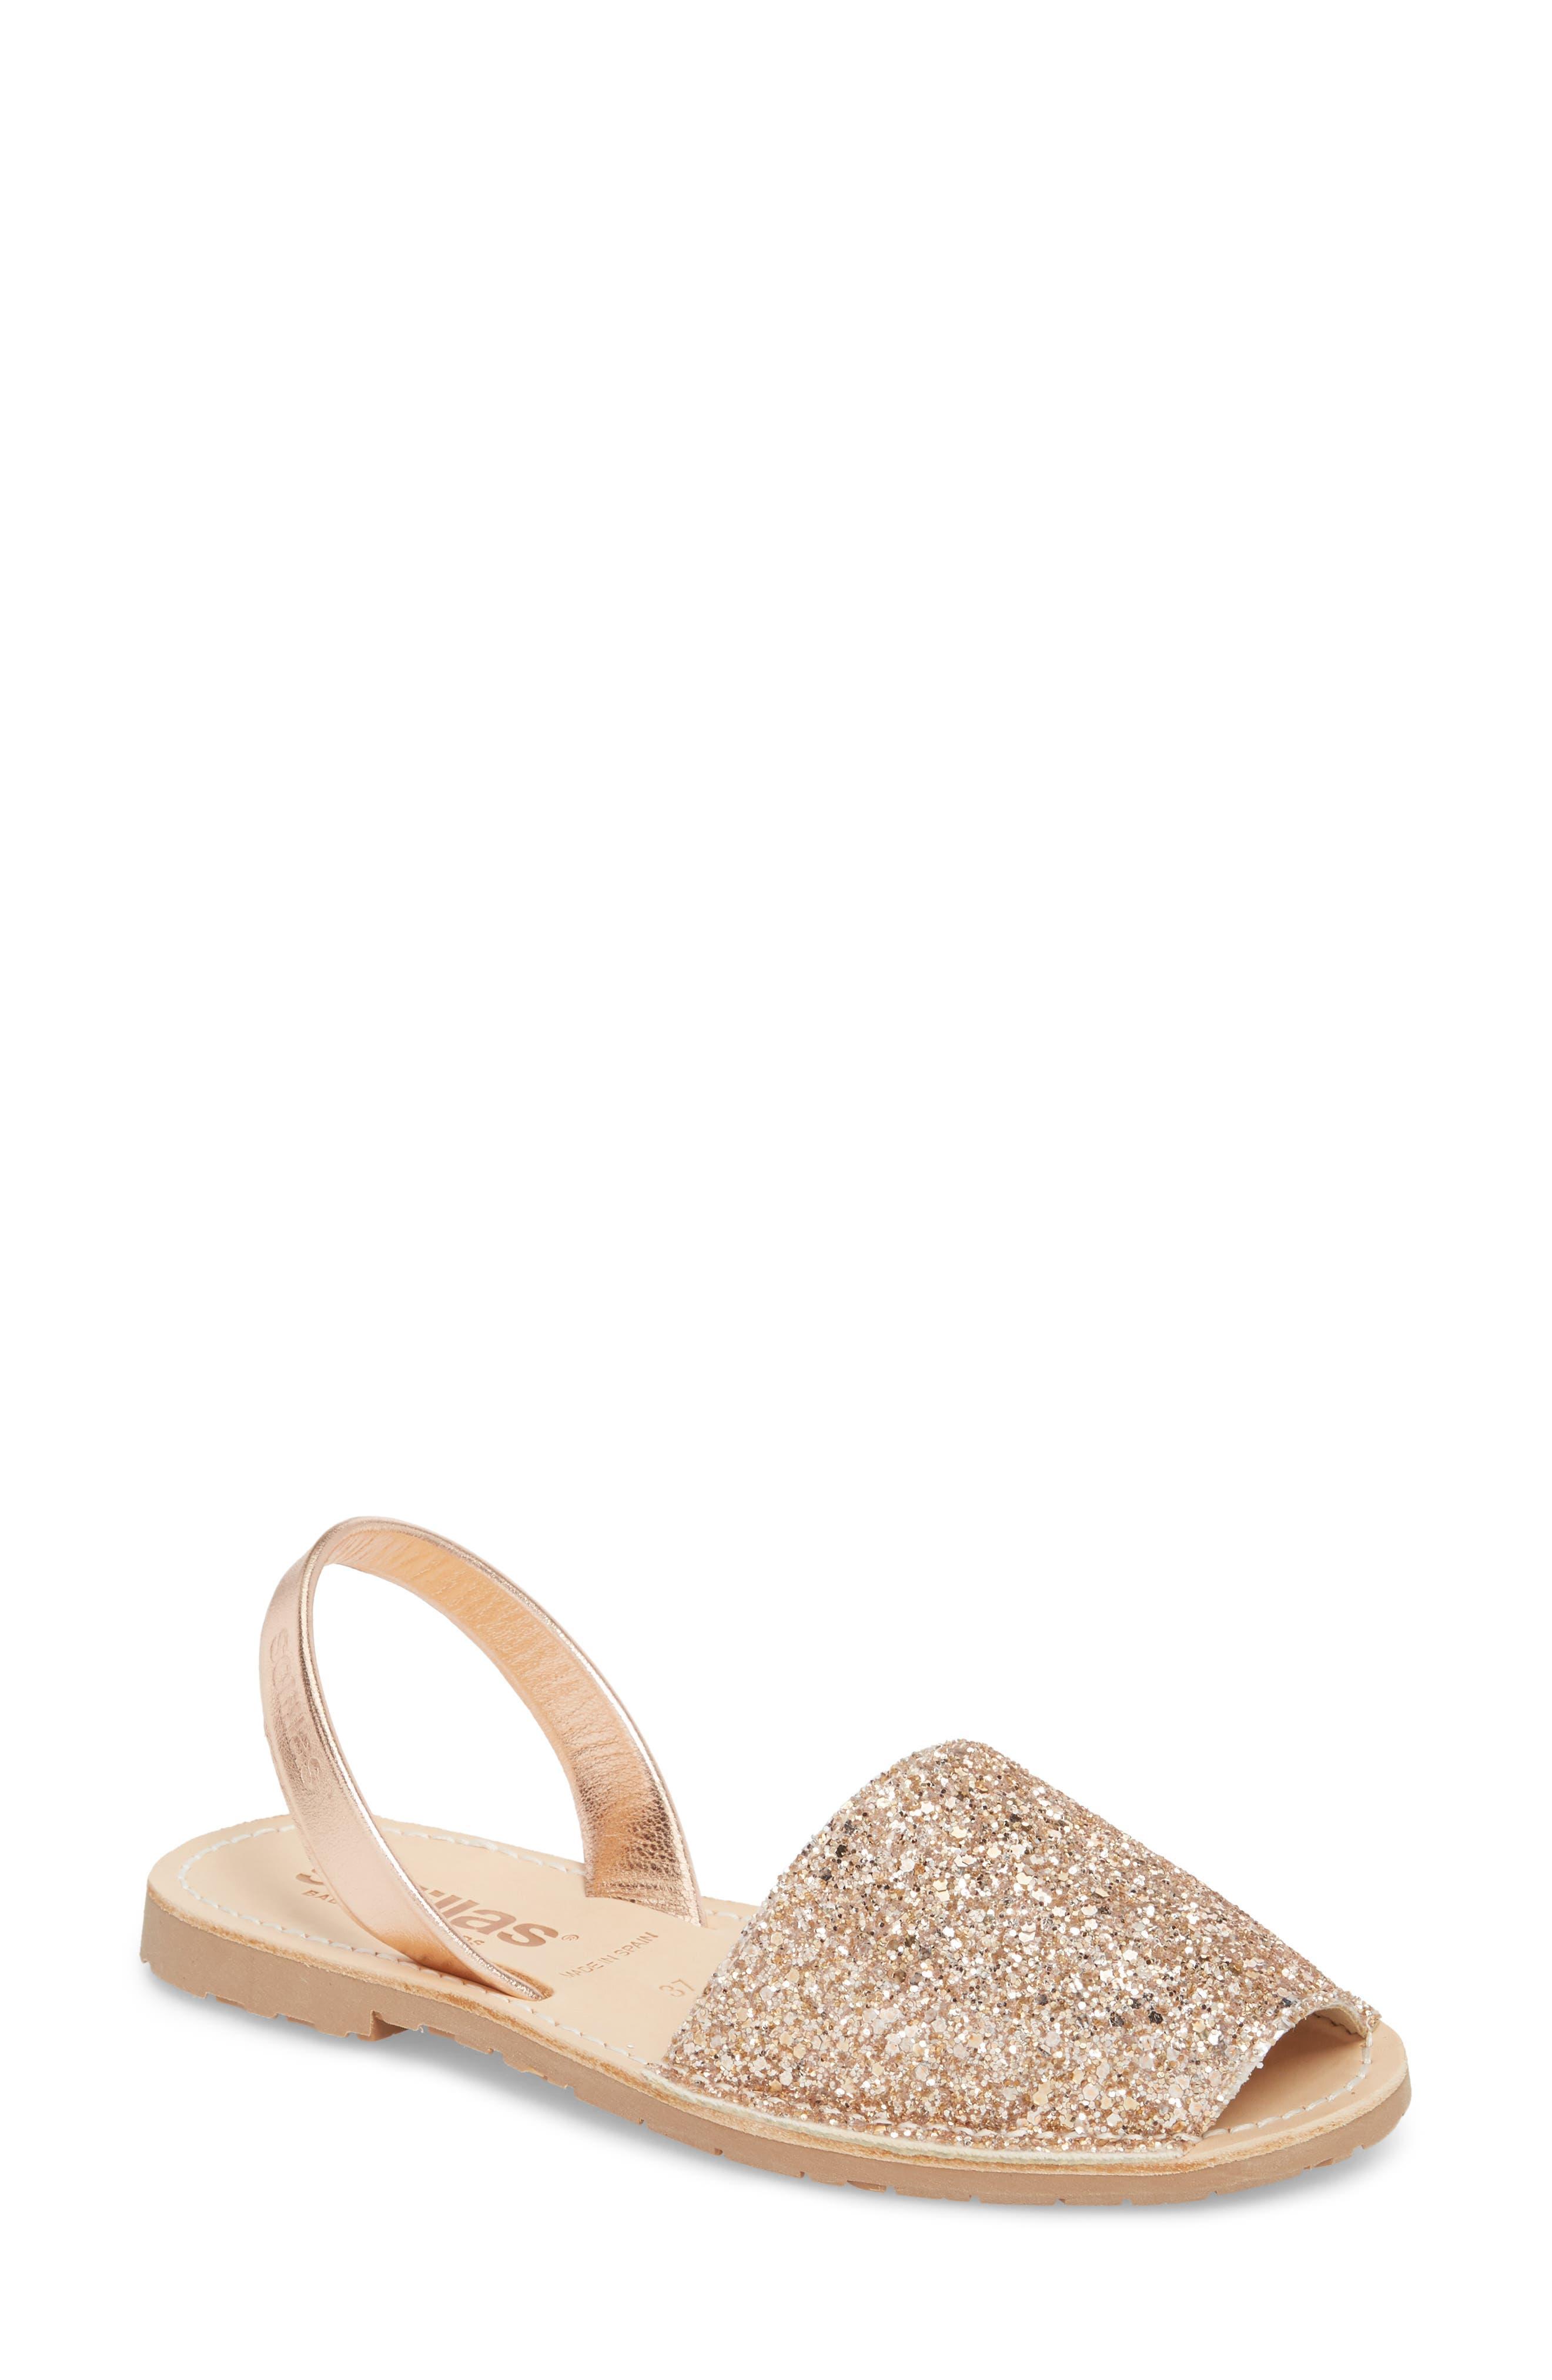 Flat Sandal,                         Main,                         color, Rose Gold Leather